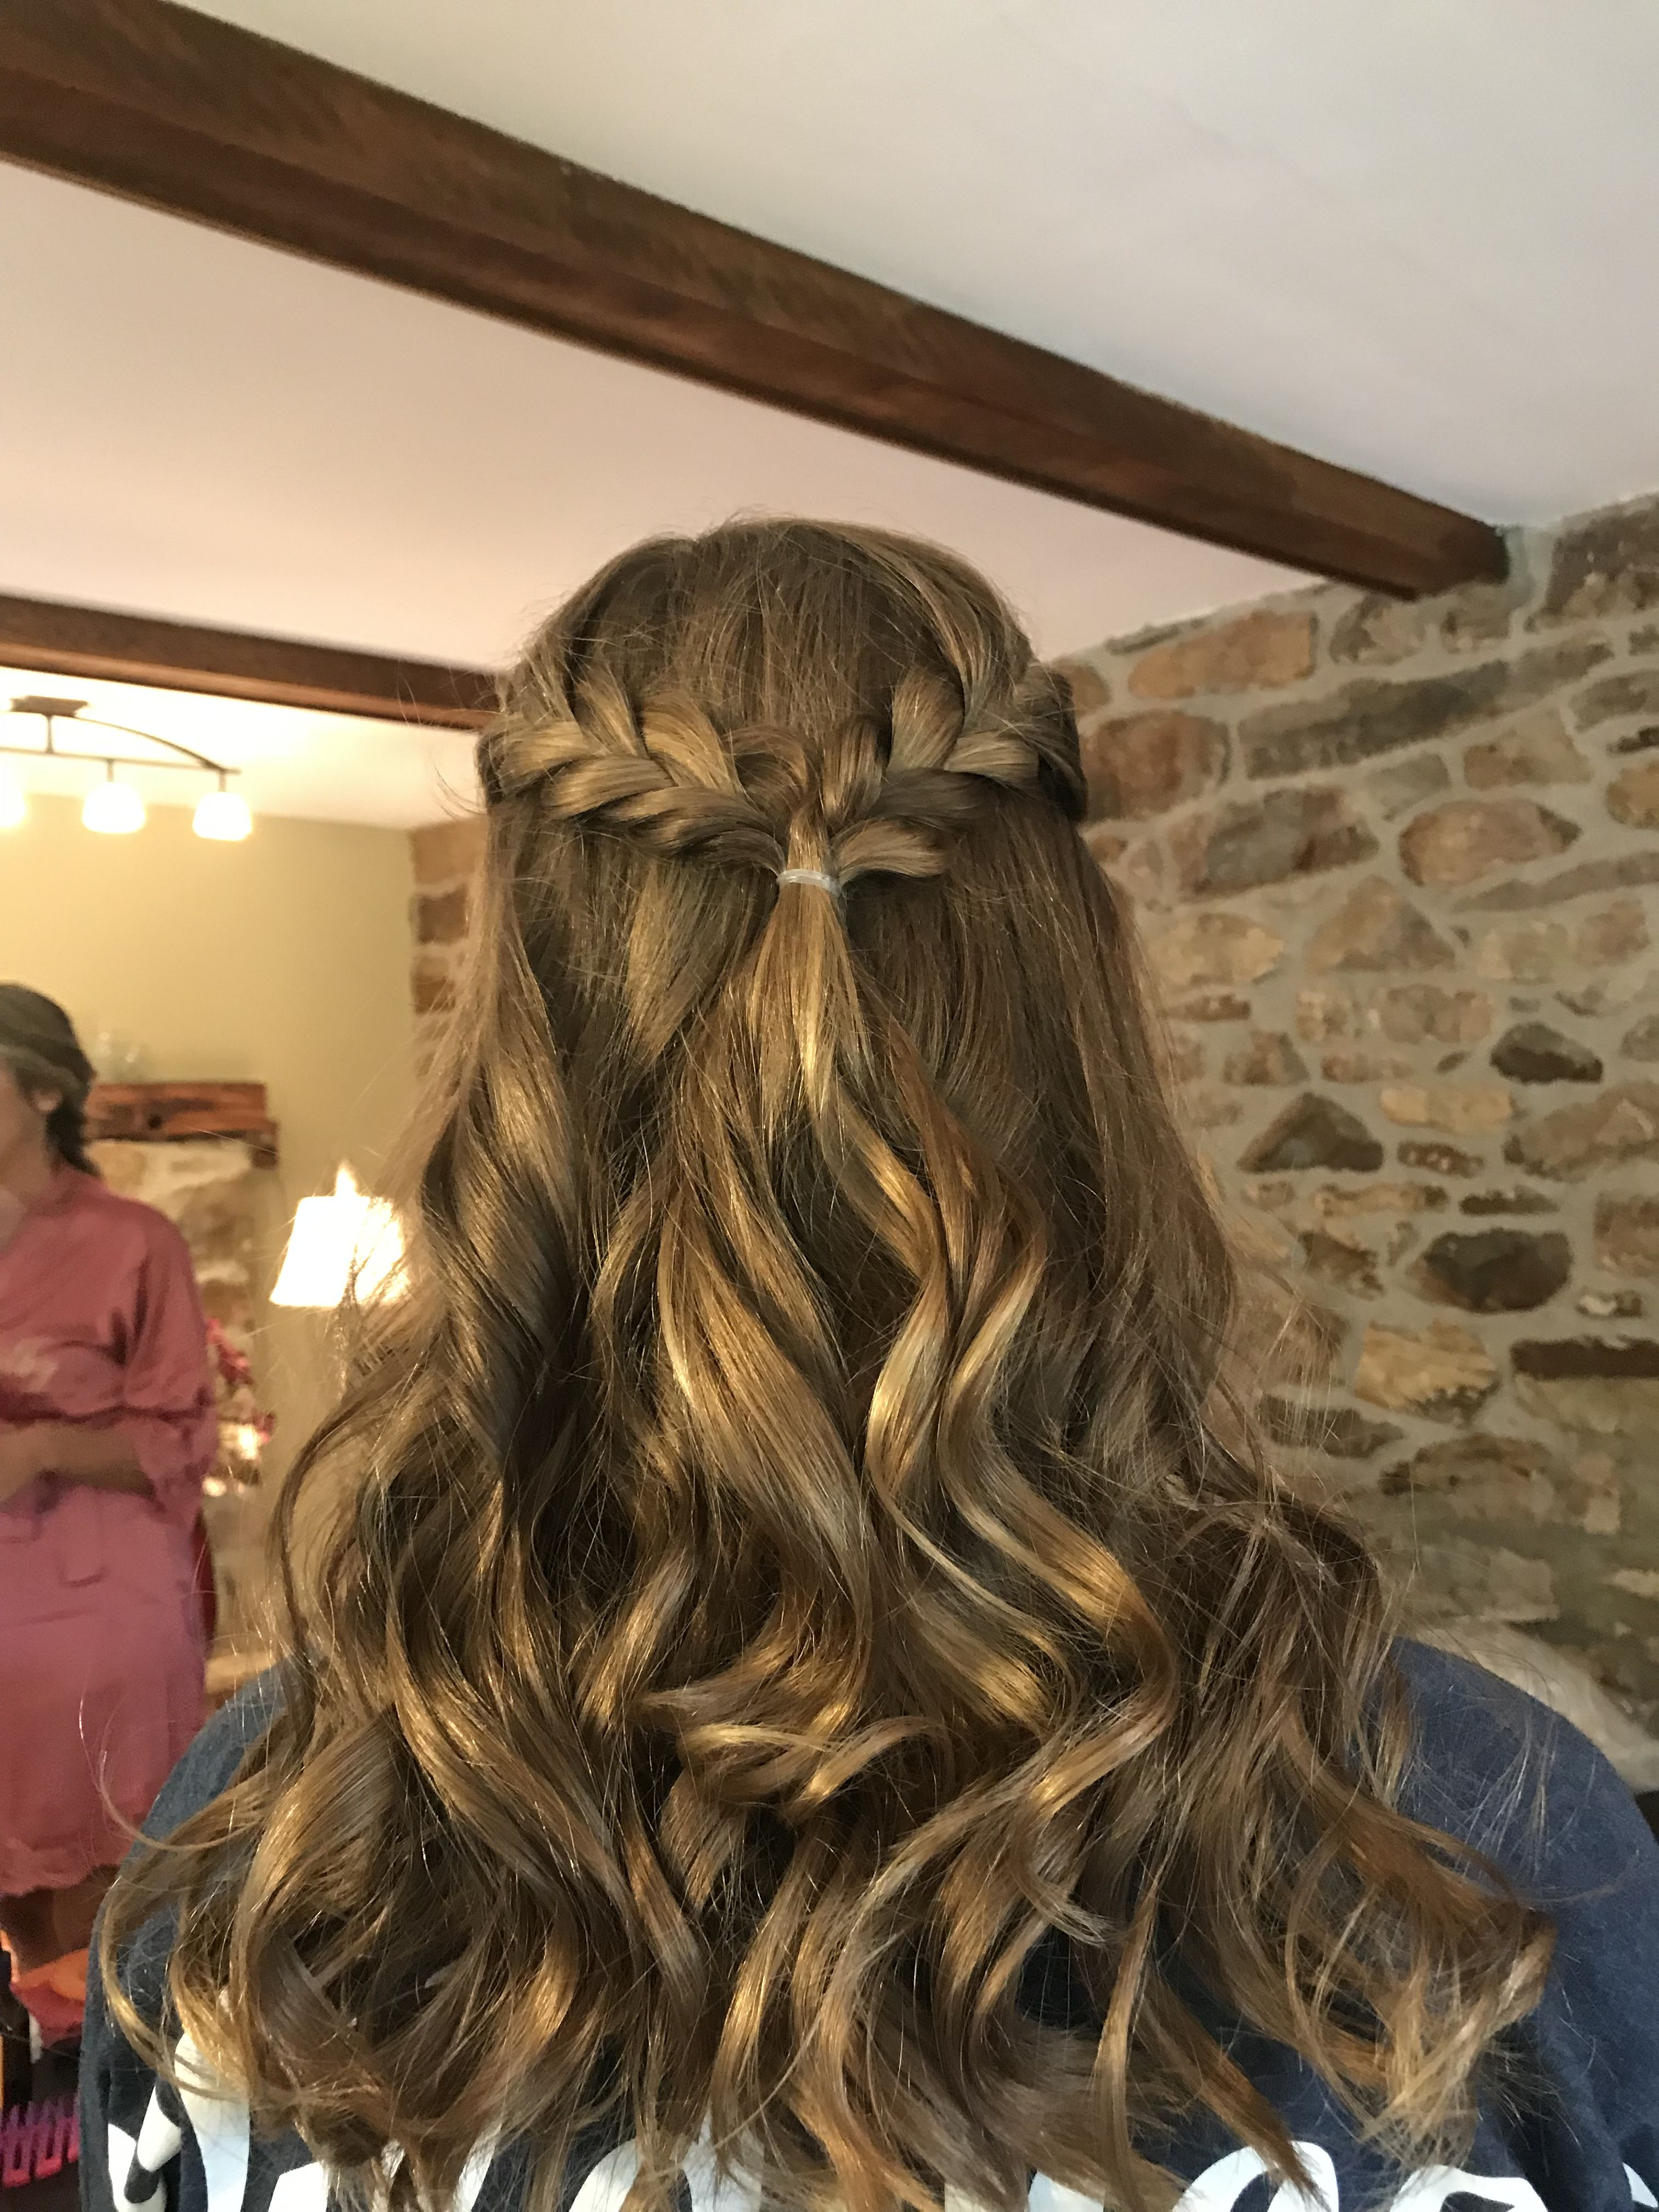 Cute hairstyle braided half up half down